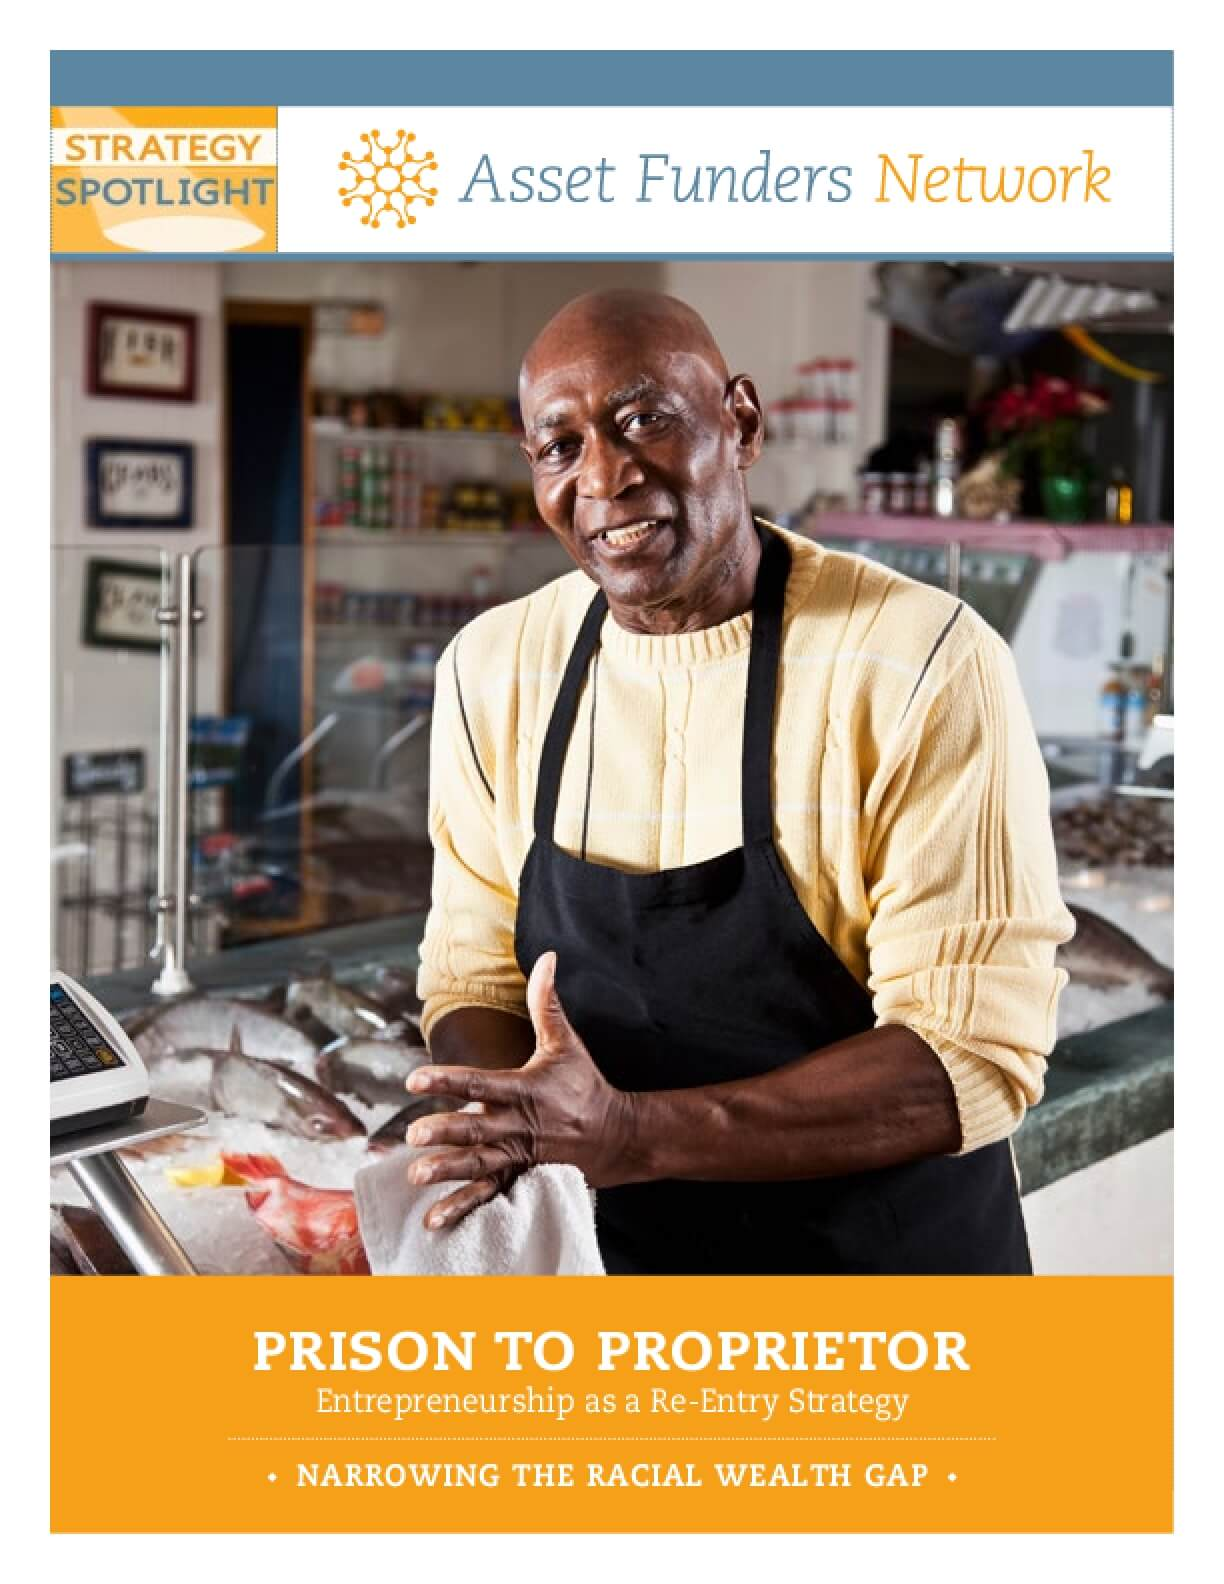 Prison To Proprietor: Entrepreneurship as a Re-Entry Strategy - Narrowing the Racial Wealth Gap